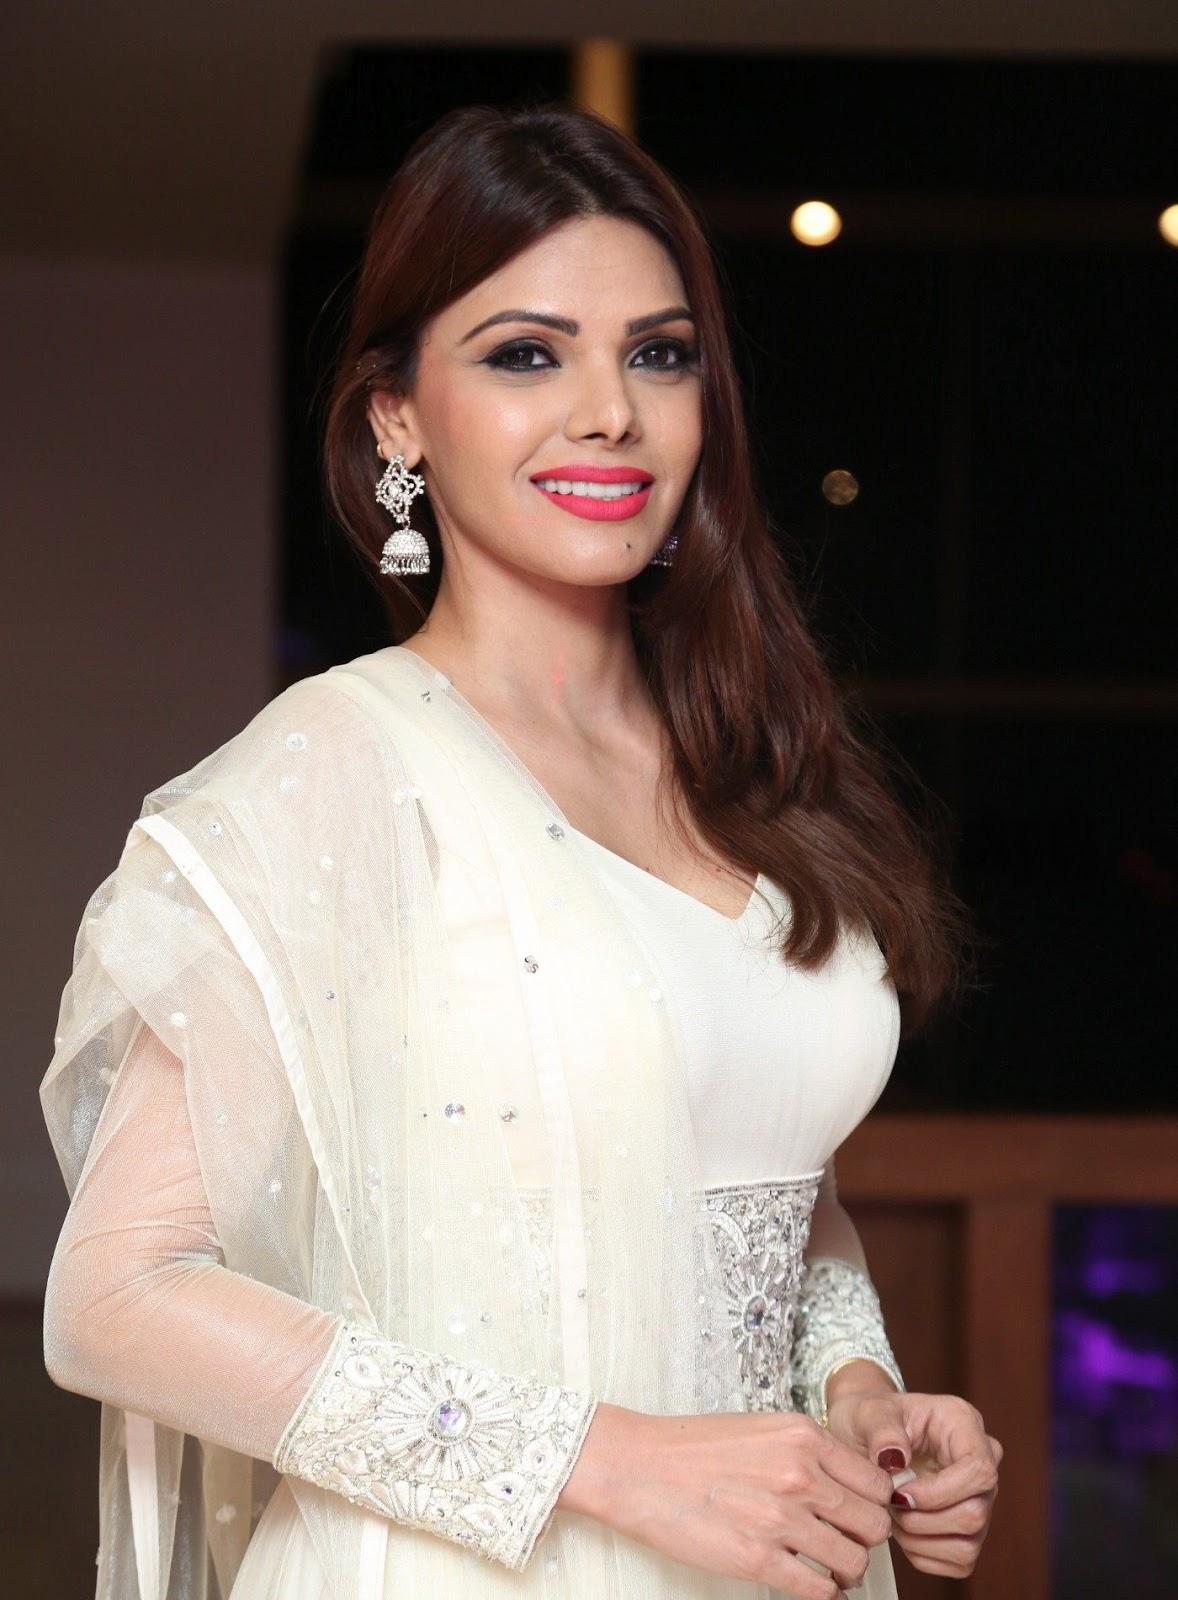 Sherlyn Chopra Looks Super Hot In White Dress At Dj Inayah -2847